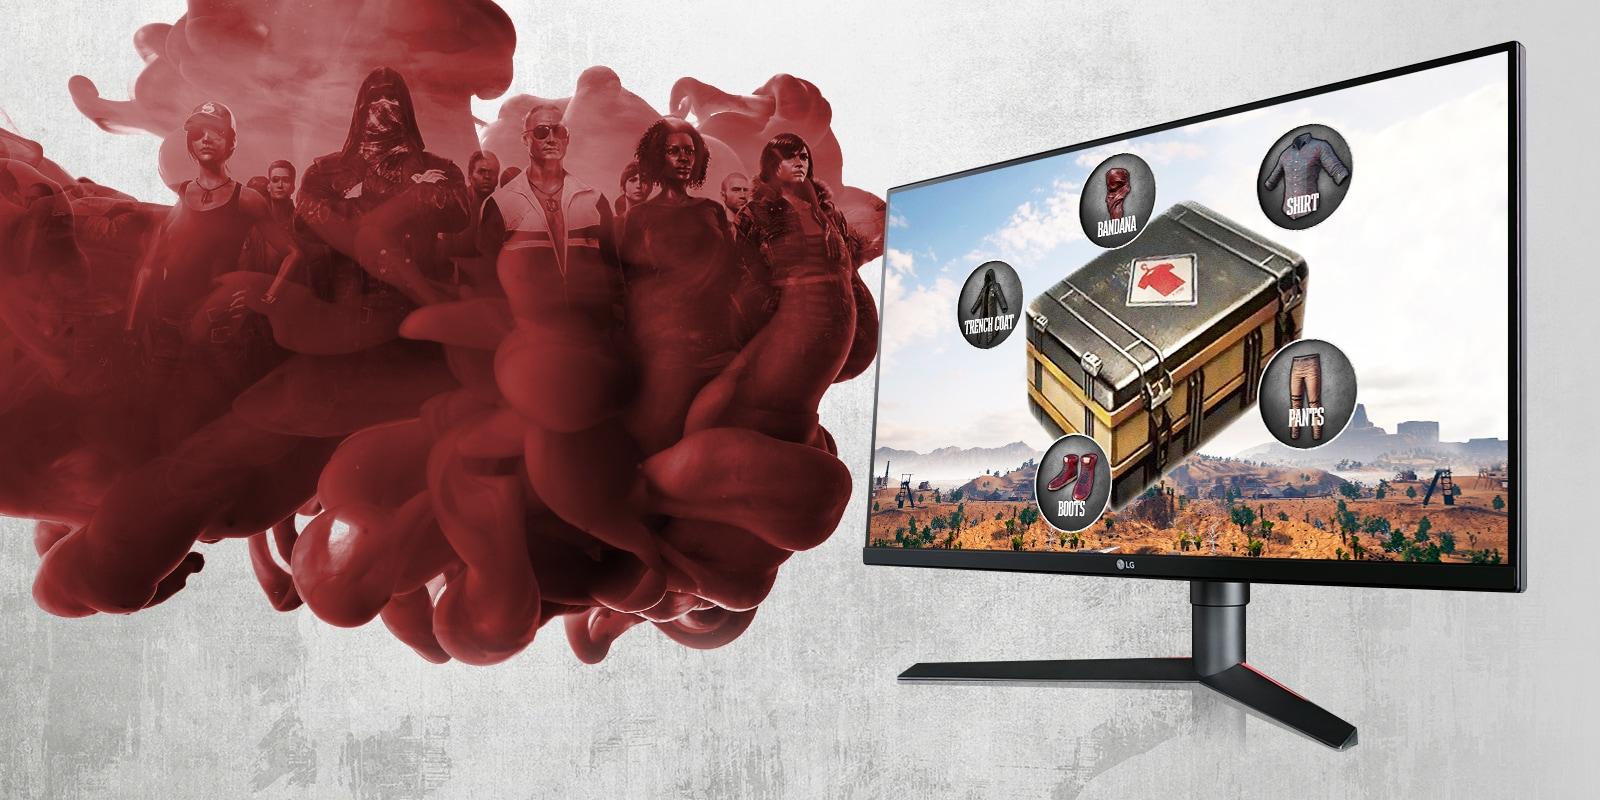 Pubg Banner Hd: LG Türkiye: Televizyon, Akıllı Telefon, Beyaz Eşya